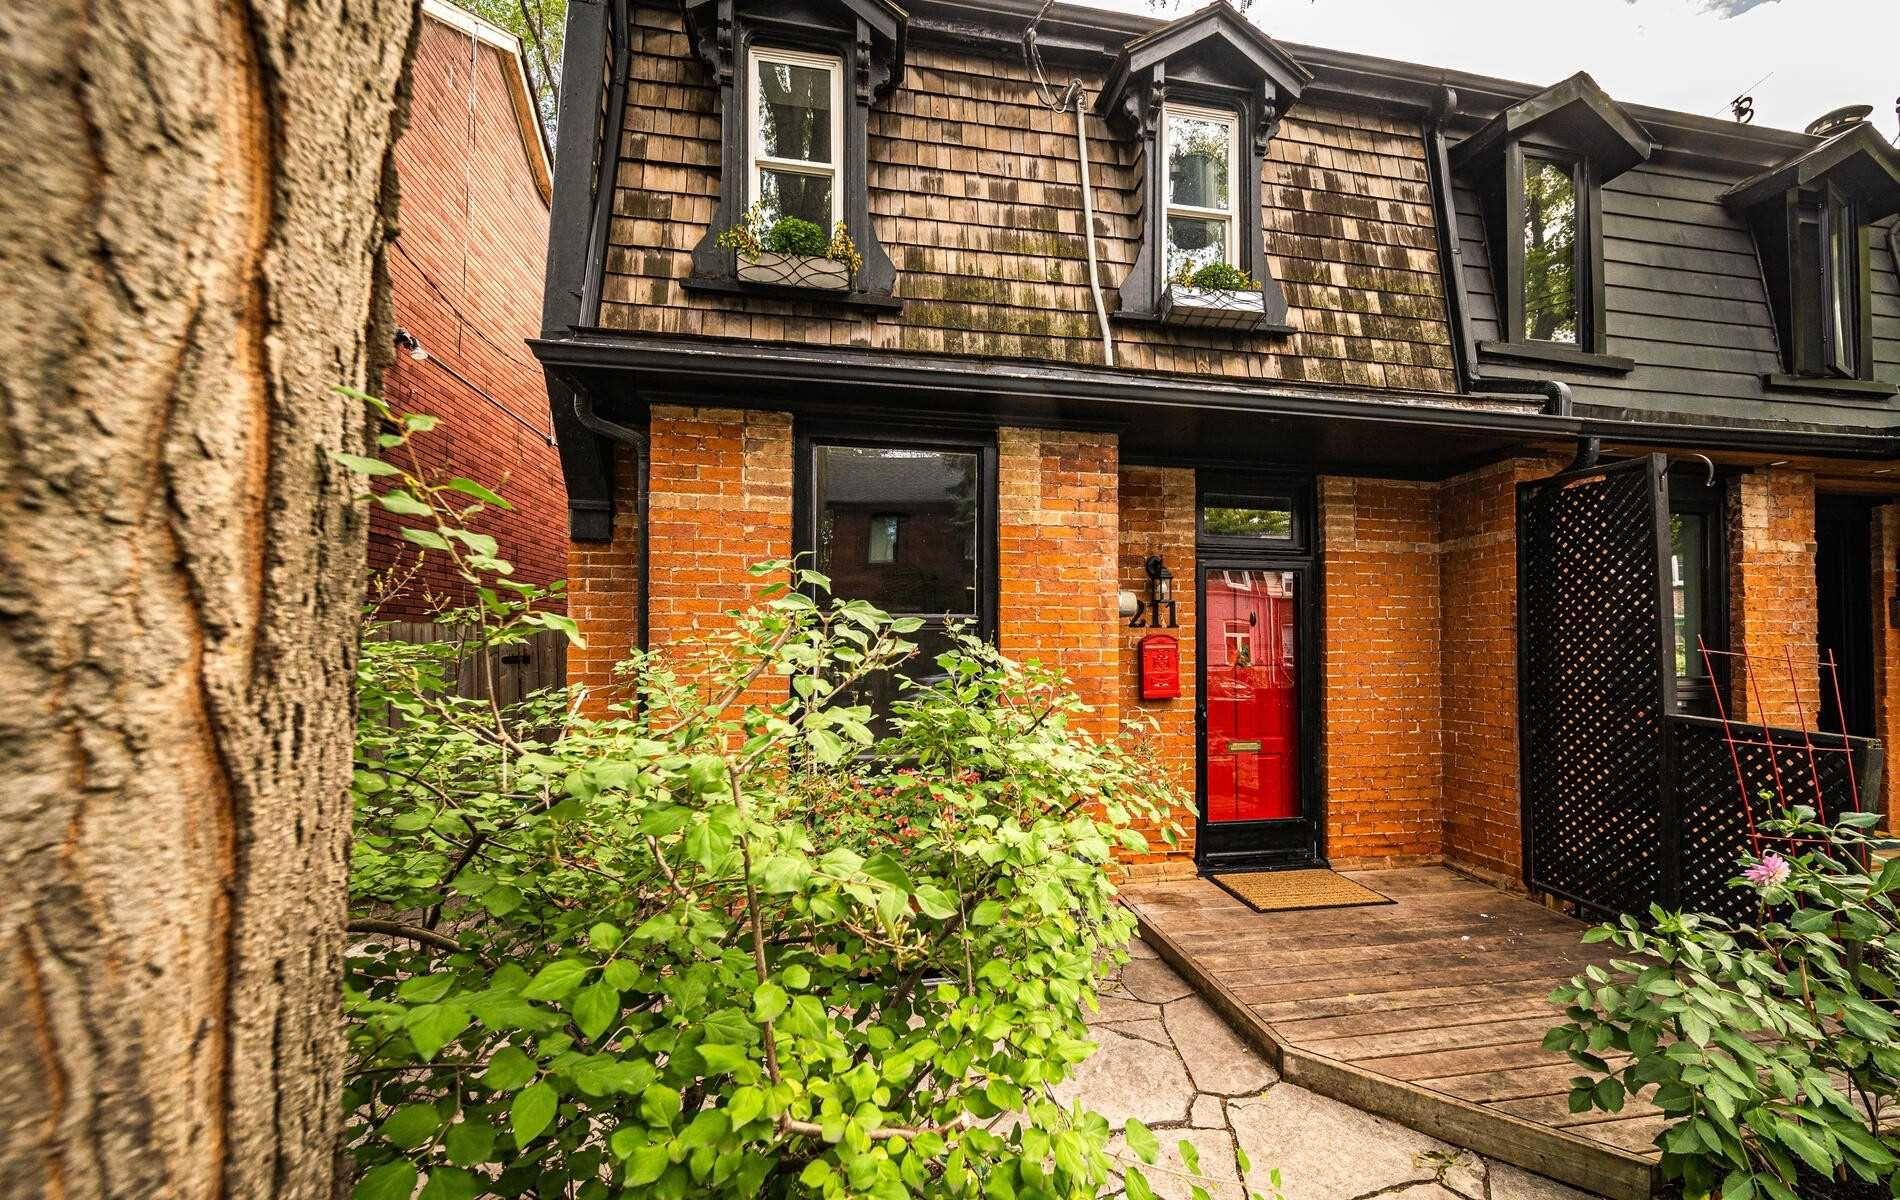 Main Photo: 211 Hamilton Street in Toronto: South Riverdale House (2-Storey) for sale (Toronto E01)  : MLS®# E5369251